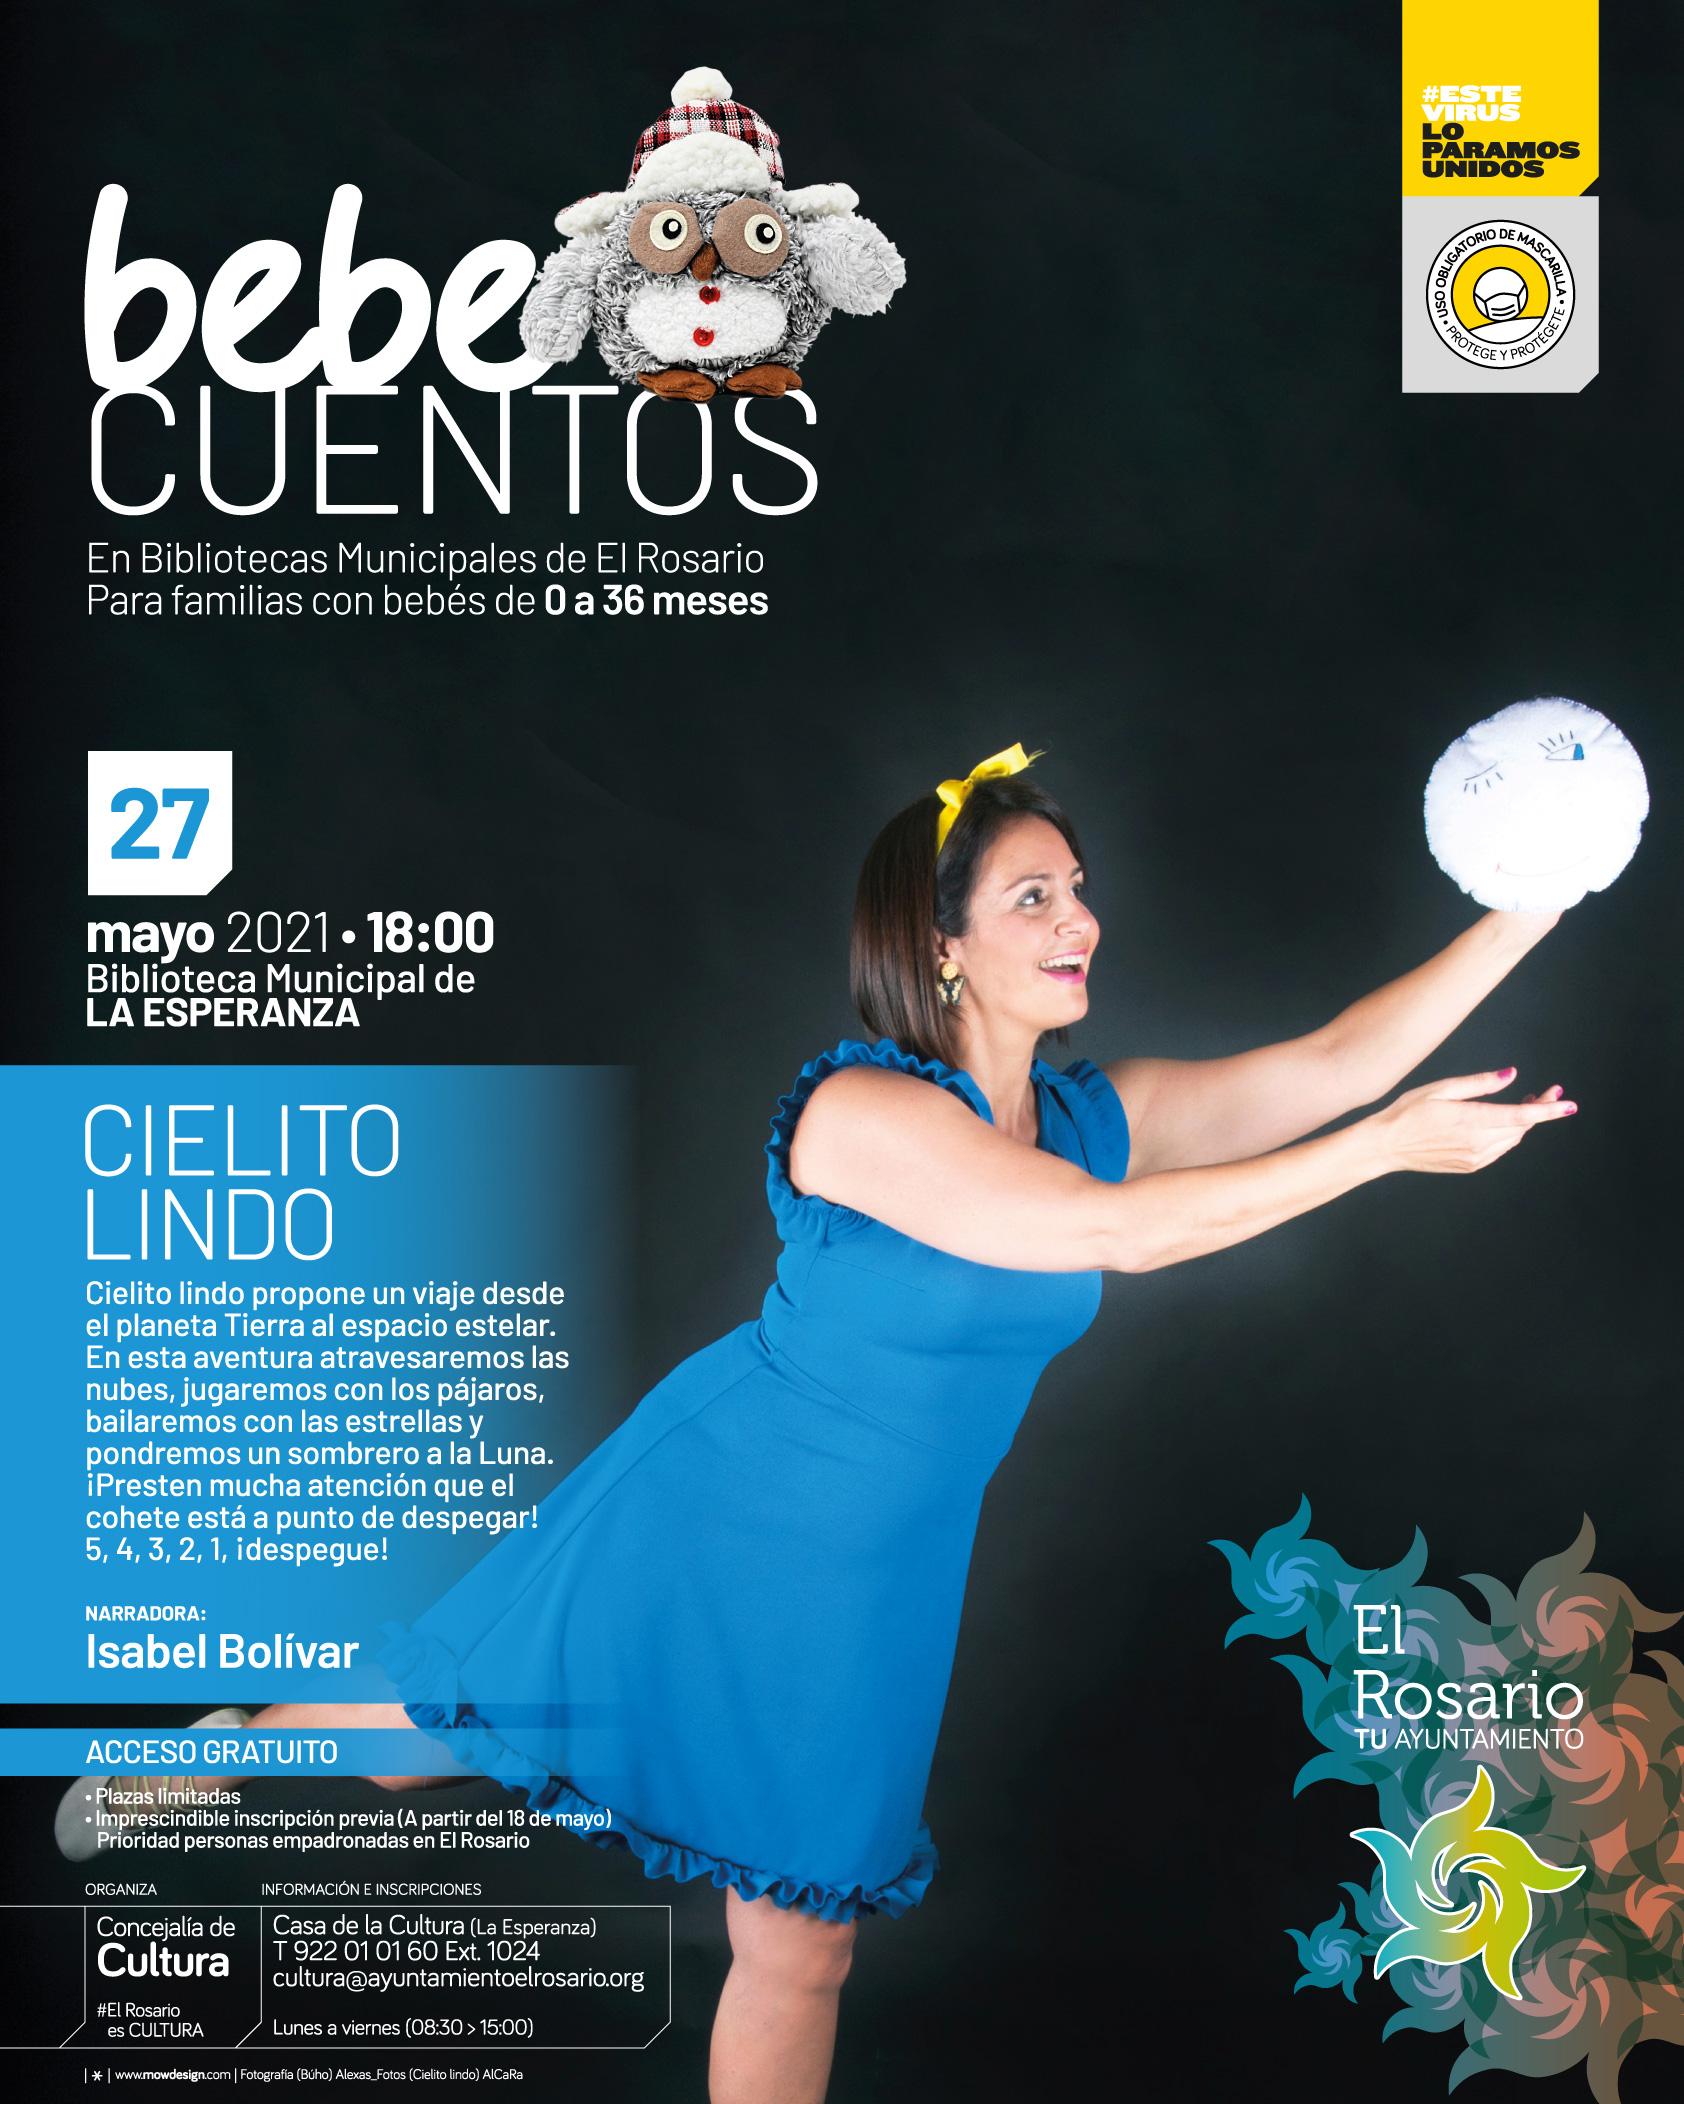 BEBECUENTOS-20210527-CARTEL_A3-20210506-01af-redes